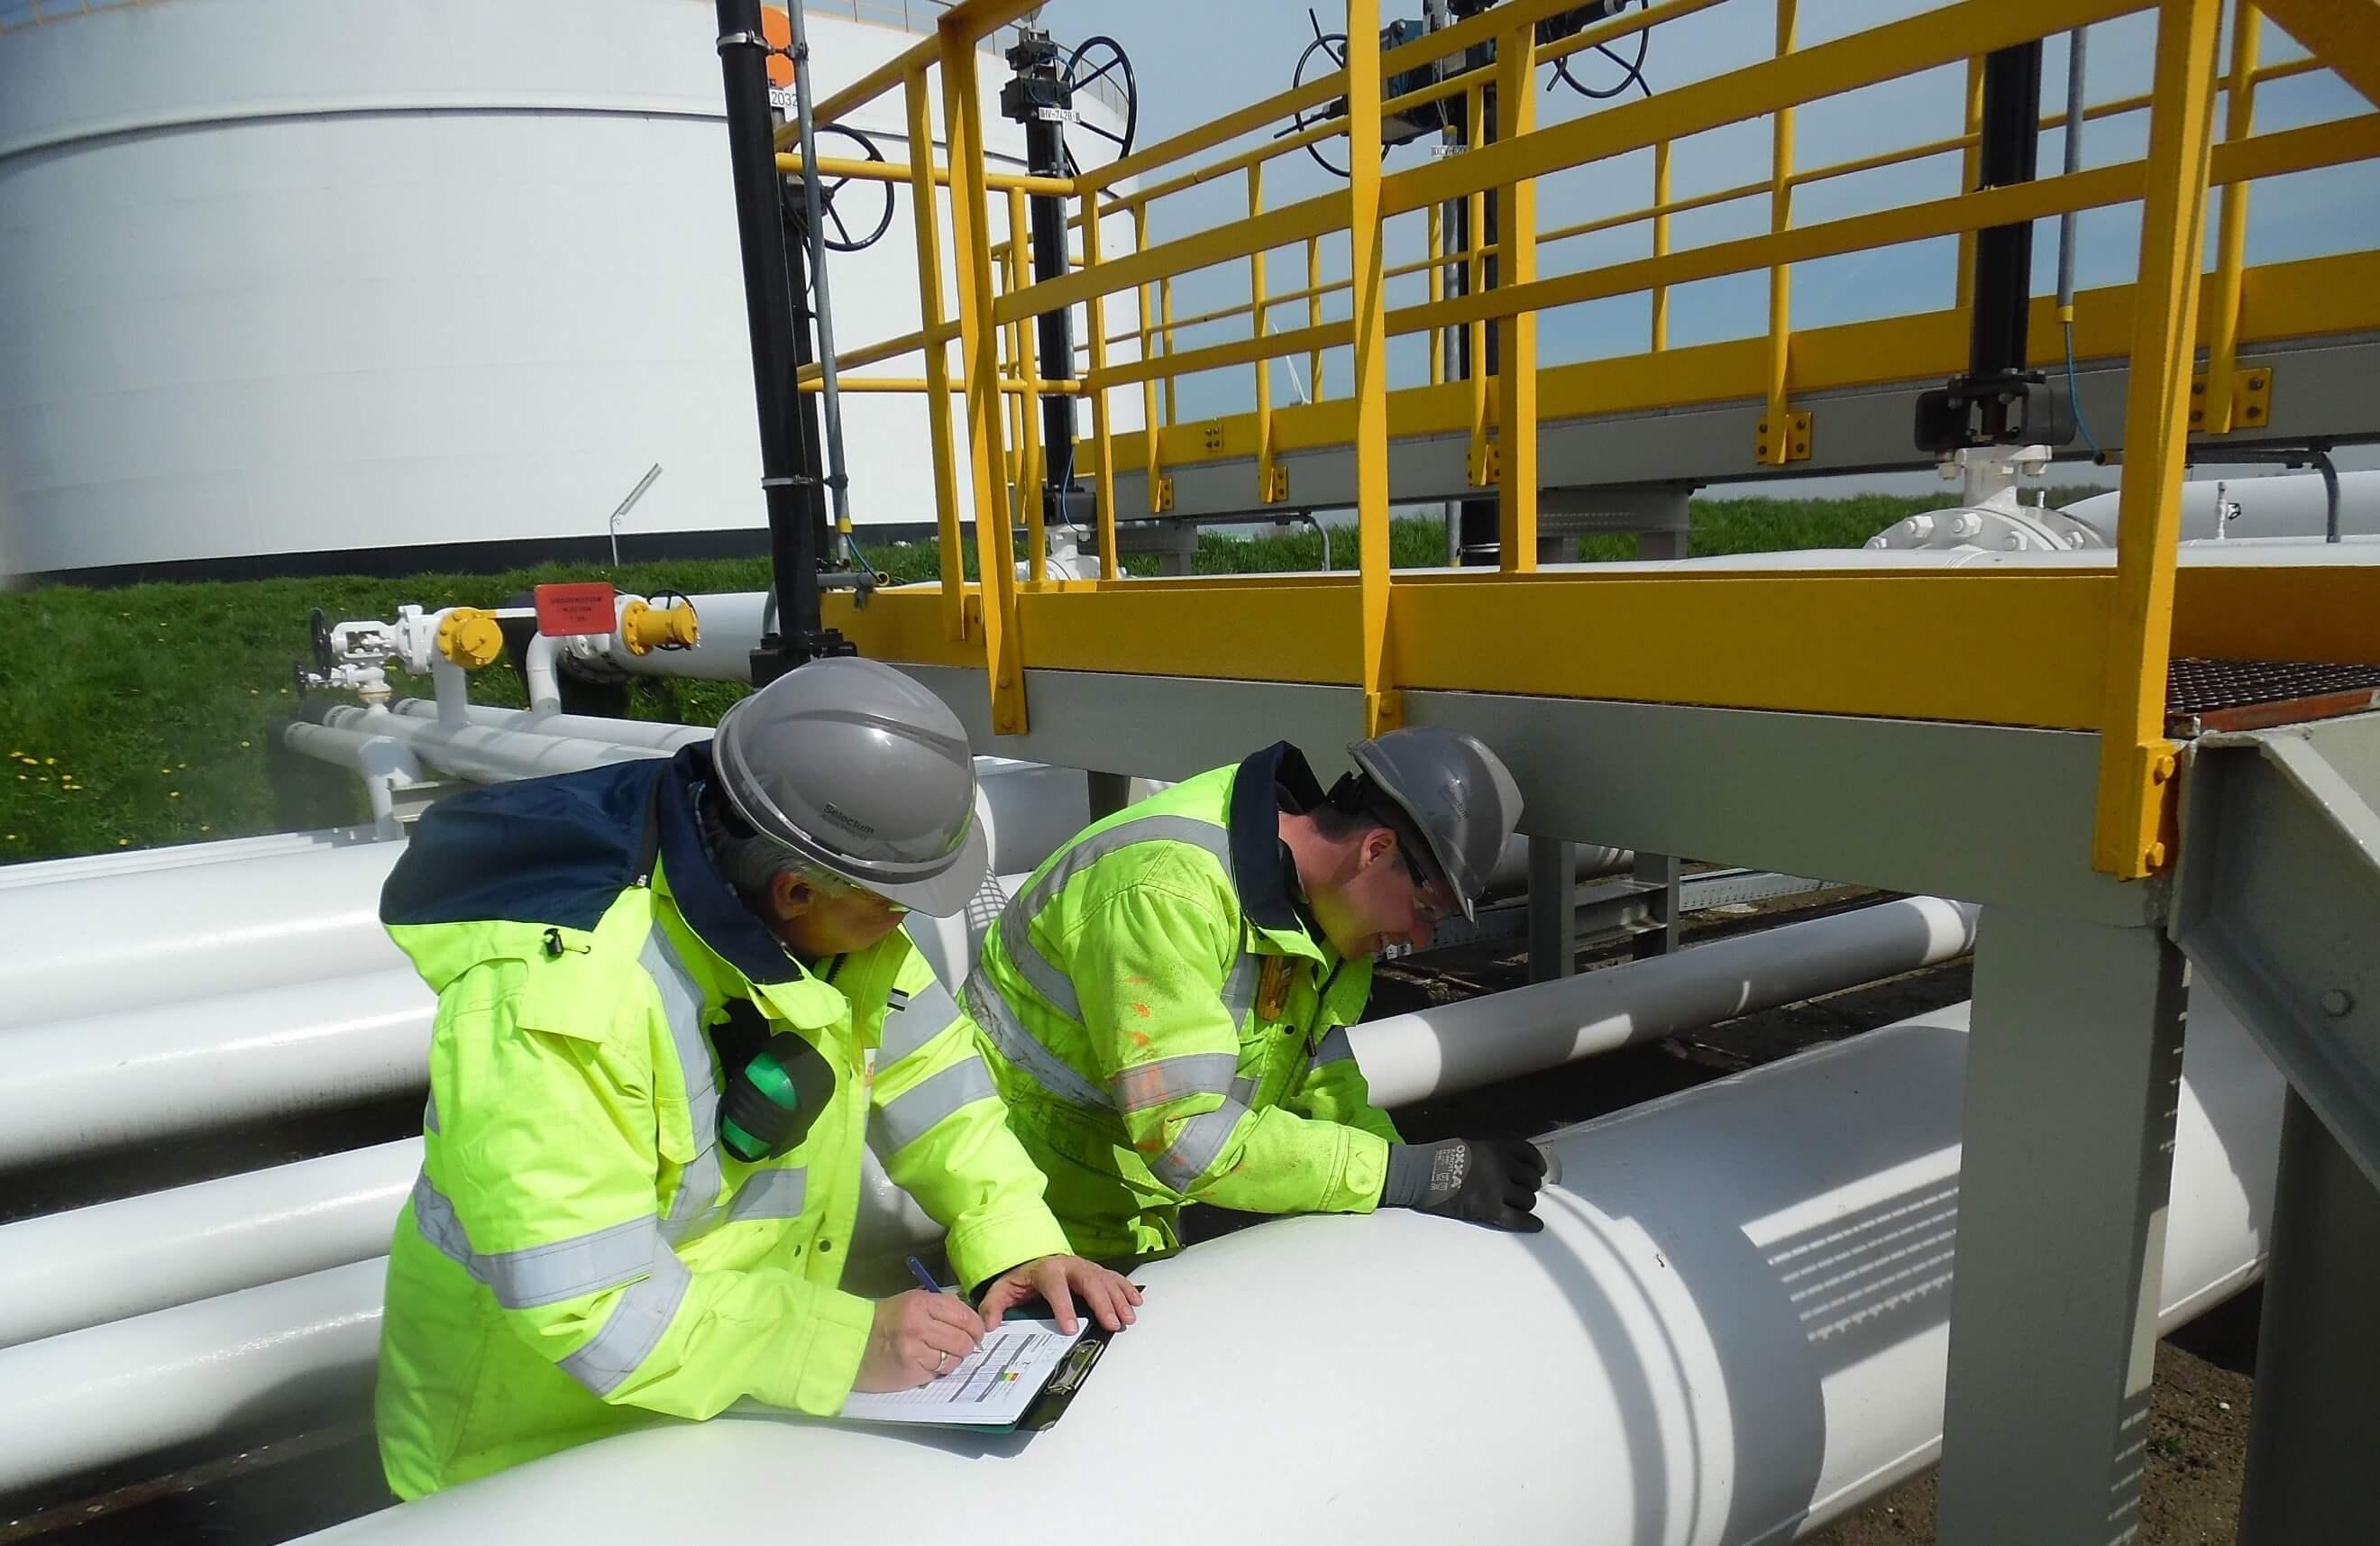 Interview Rolf Zuidgeest, Inspecteur BP Raffinaderij Rotterdam (freelance)